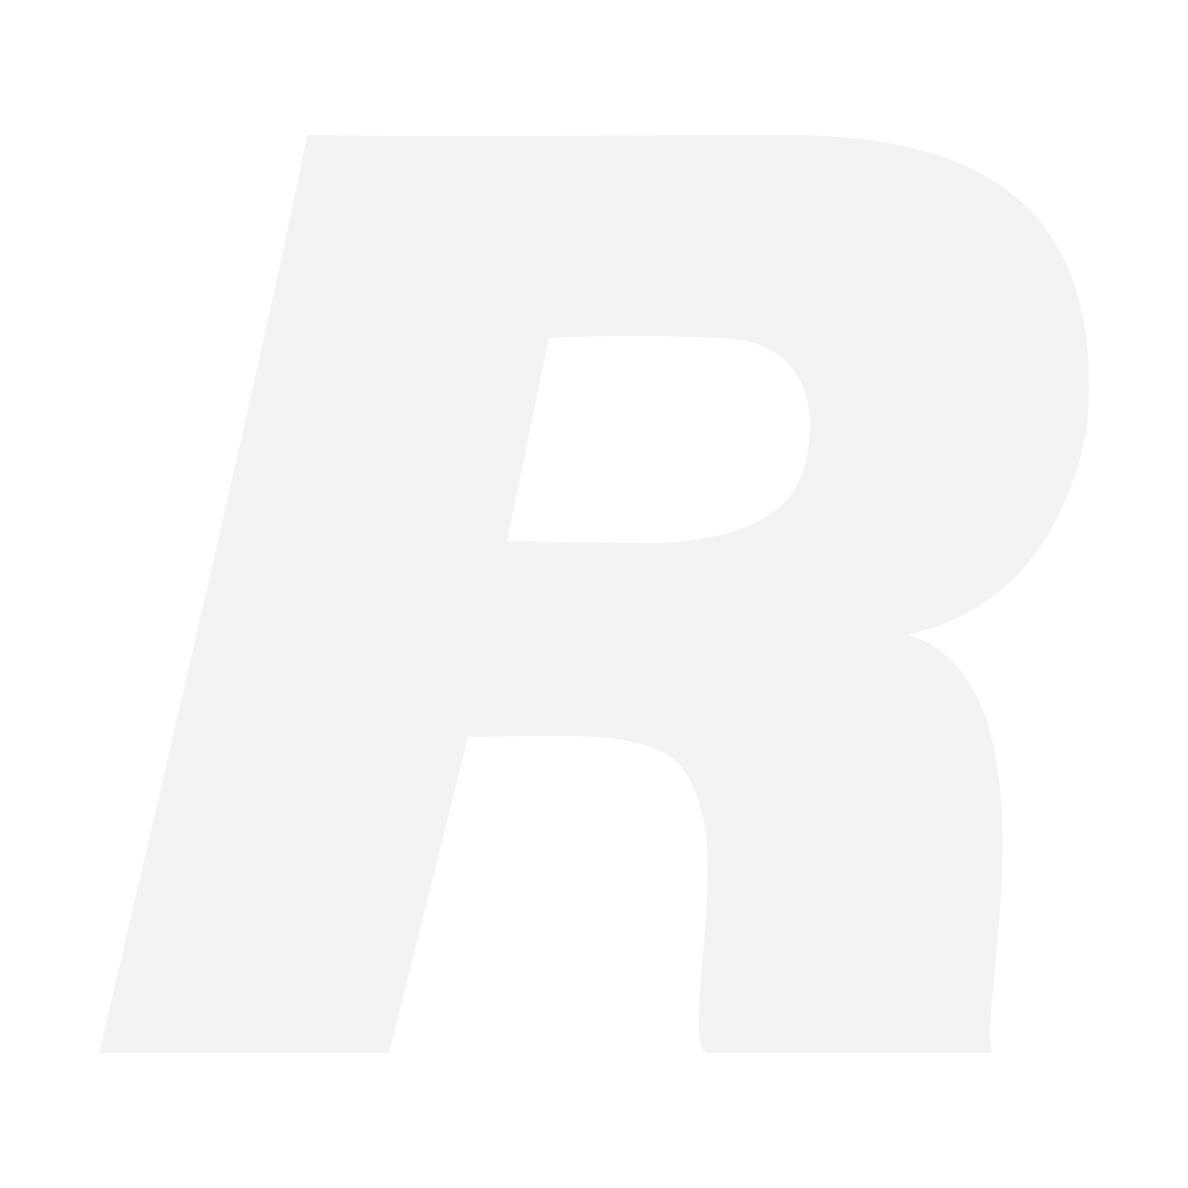 Sony A7R Mark III + Zeiss Vario Tessar T* FE 24-70/4 ZA OSS